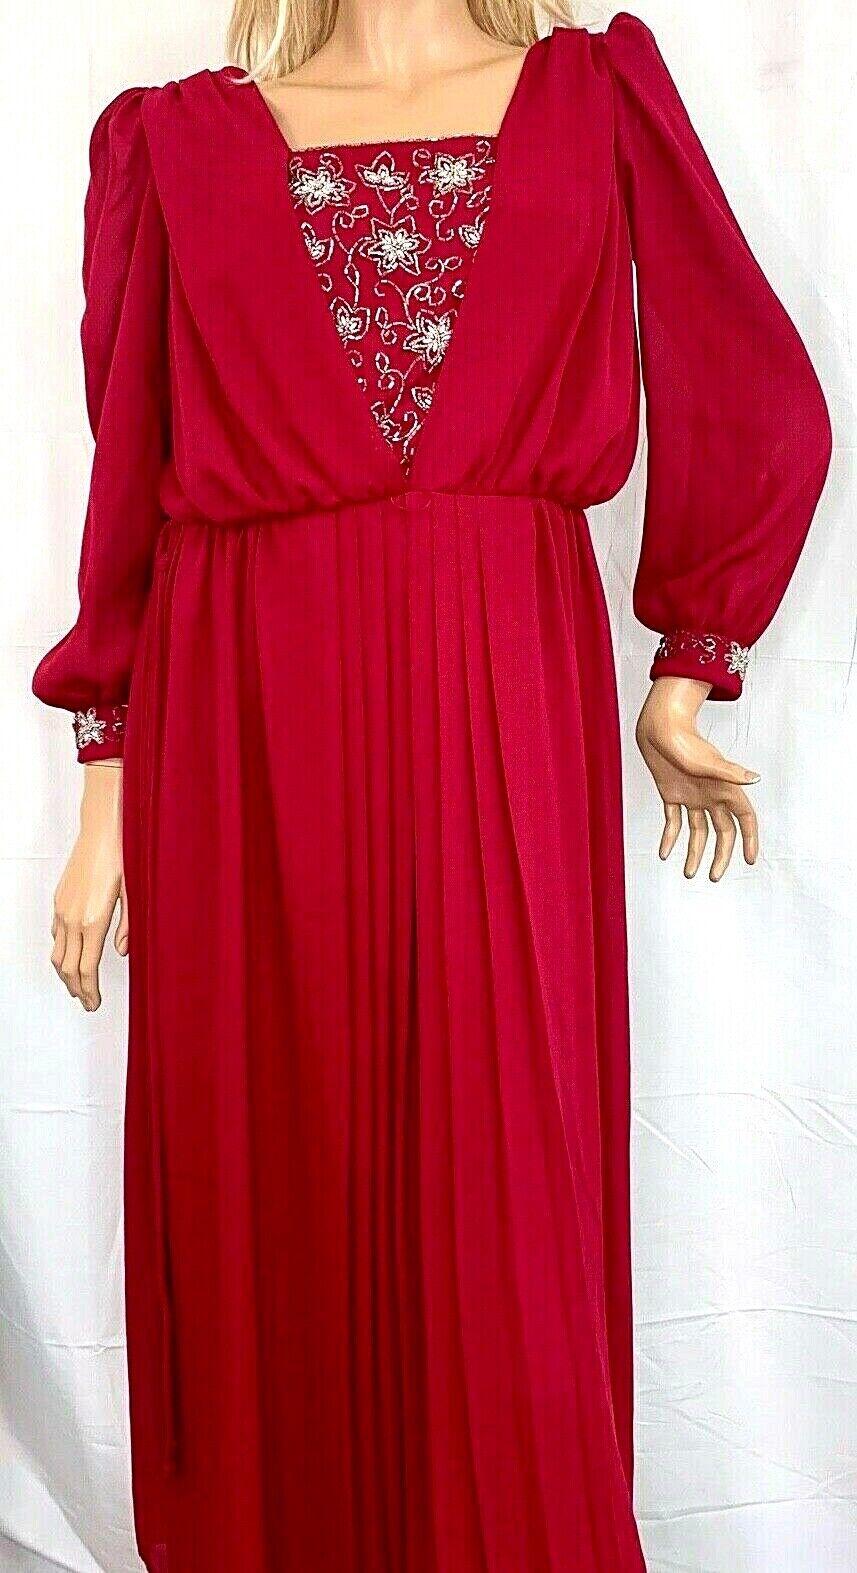 Vtg Womens Evening Gown Dress Maroon Red Chiffon Maxi Beaded Tie Waist Union Tag